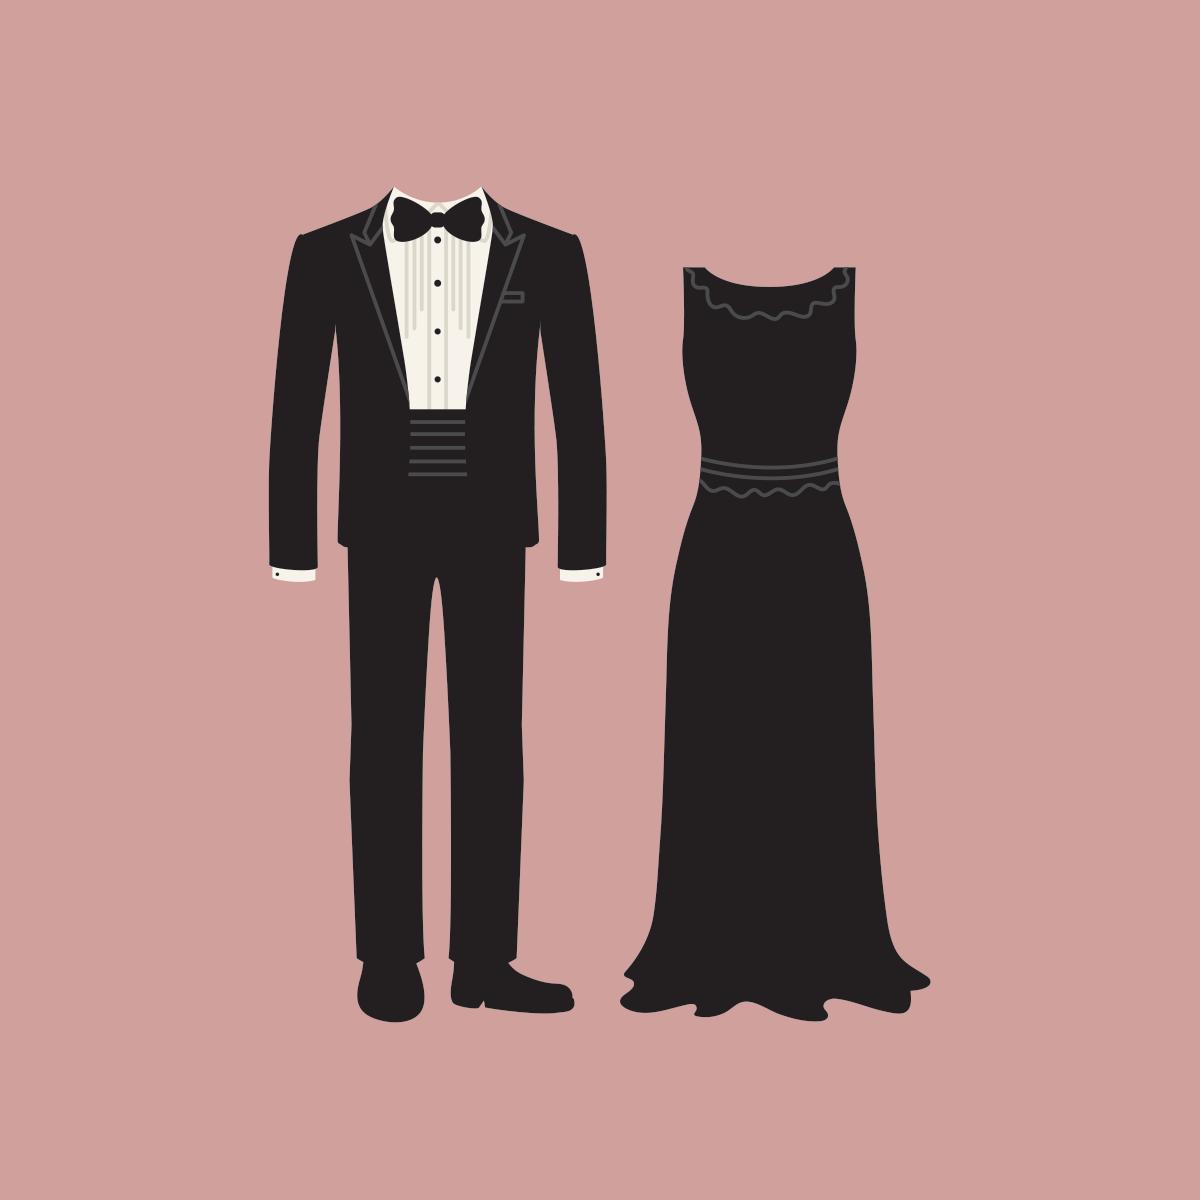 72 dress codes